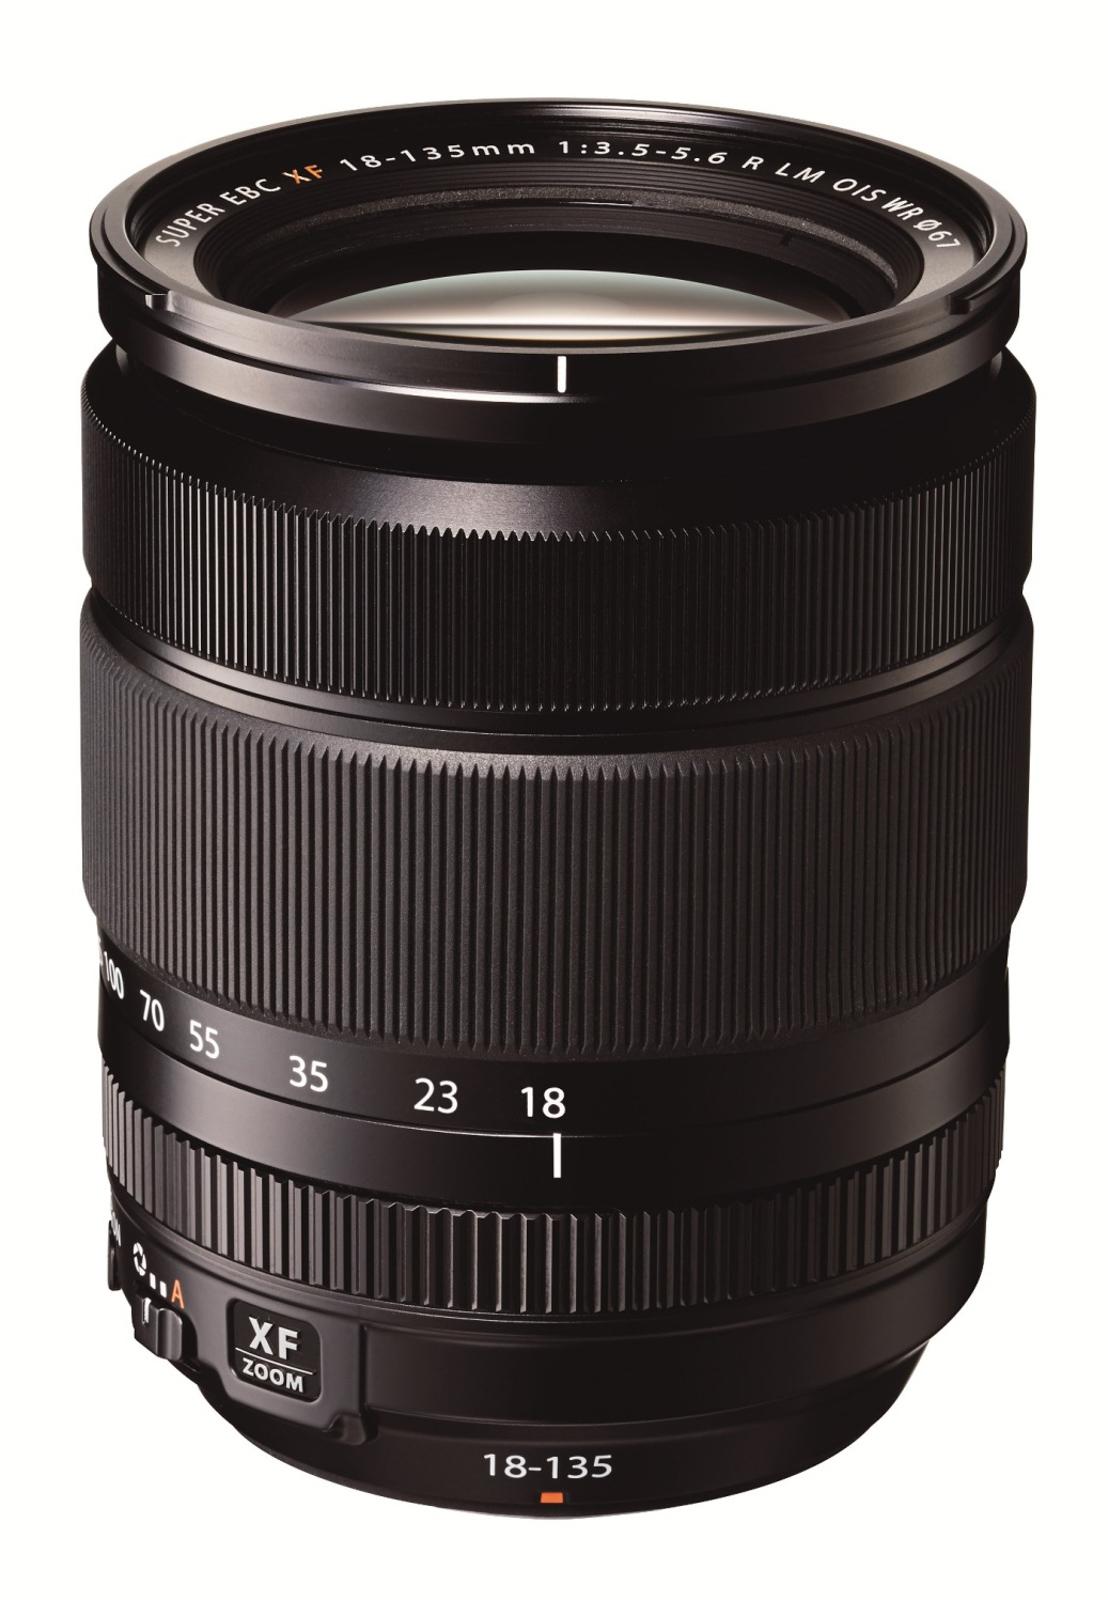 Fujifilm Fujinon XF 18-135mm F3.5-5.6 R OIS WR